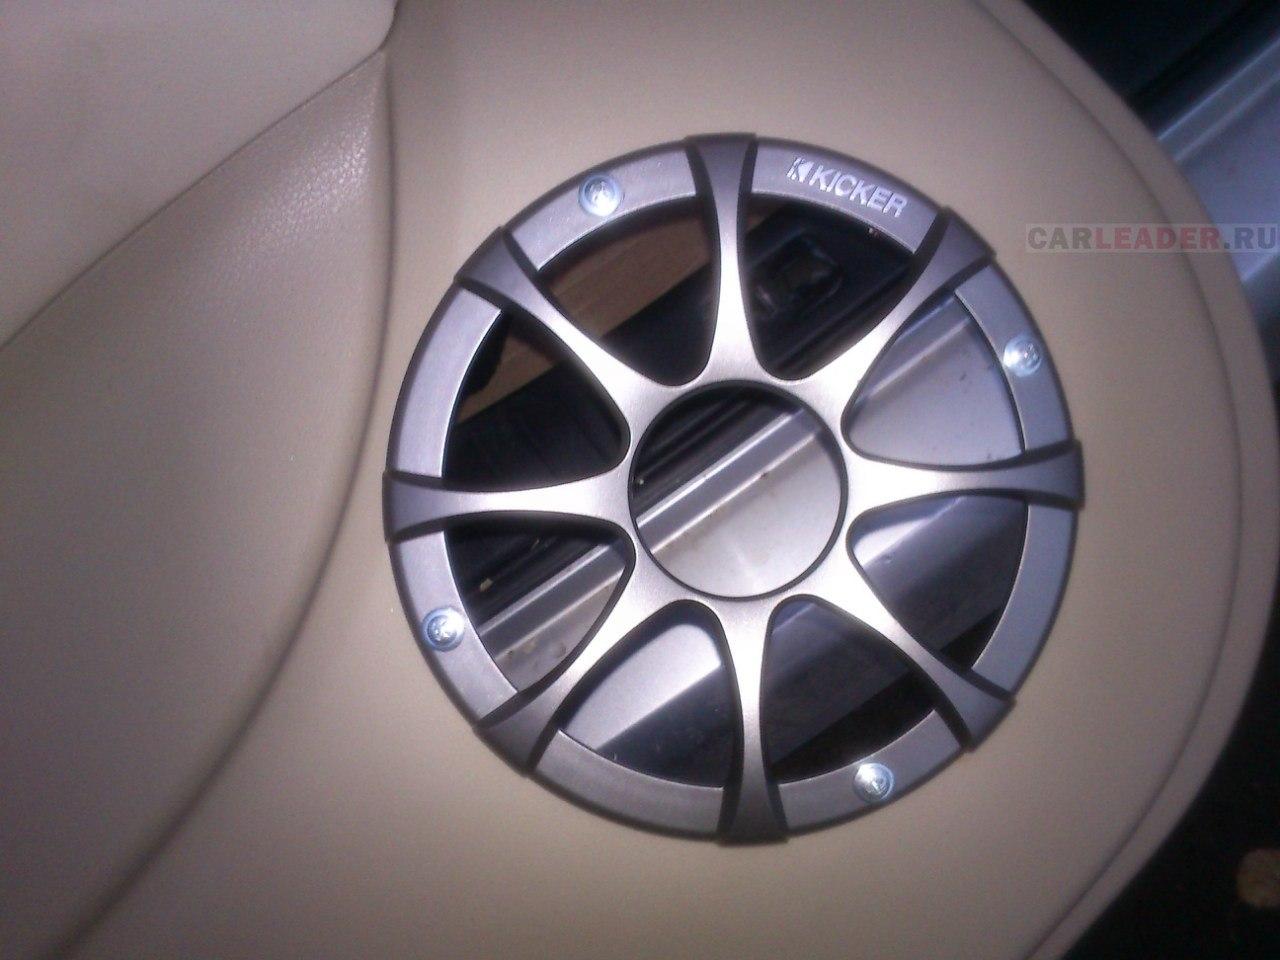 Решетка Kicker ES65 в двери Nissan Bluebird Axis